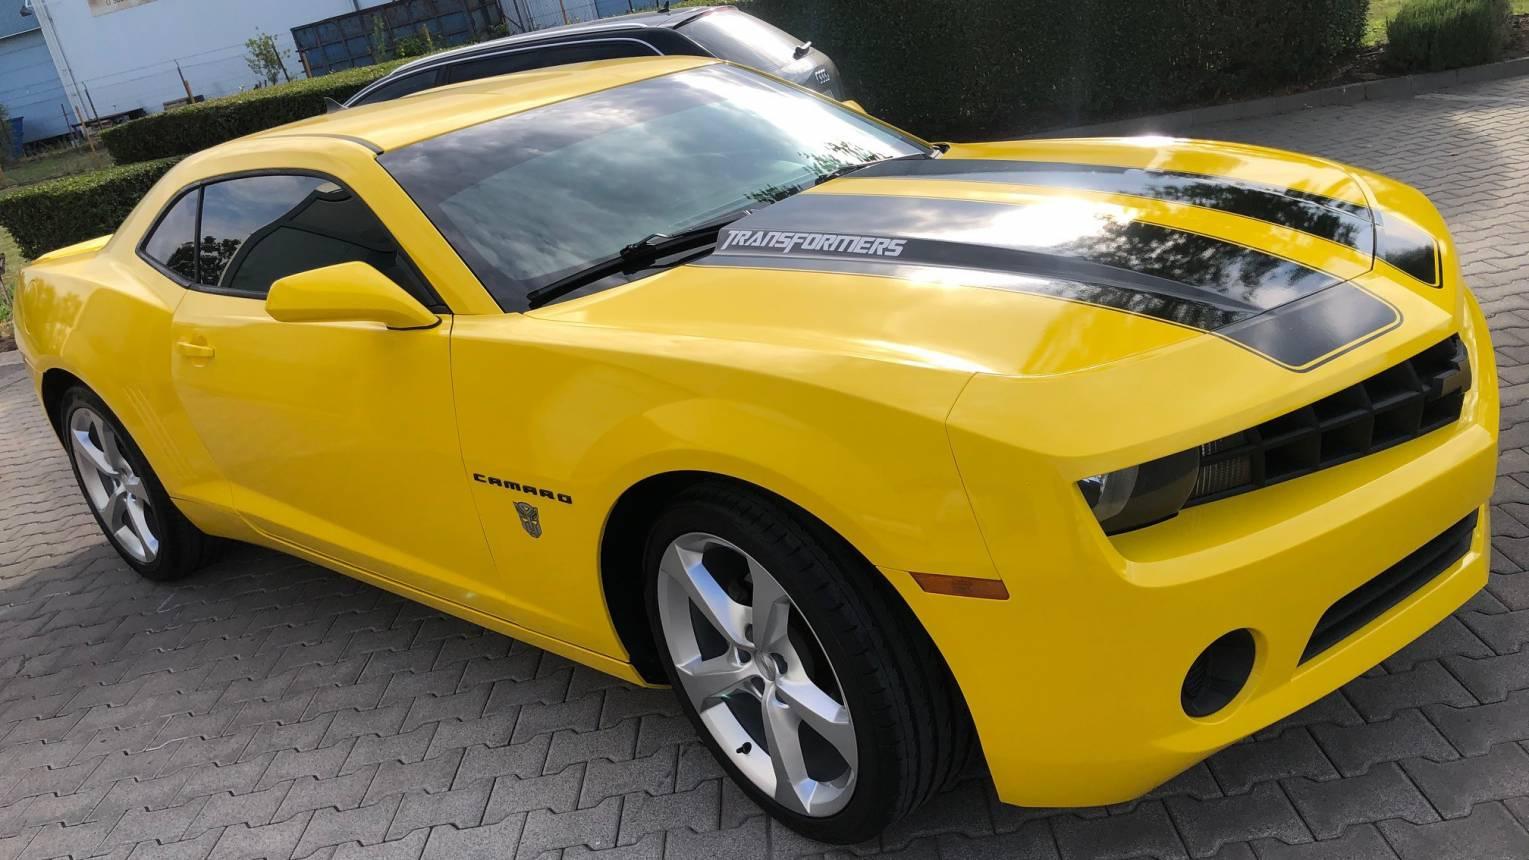 Chevrolet Camaro Transformers Edition bérlése